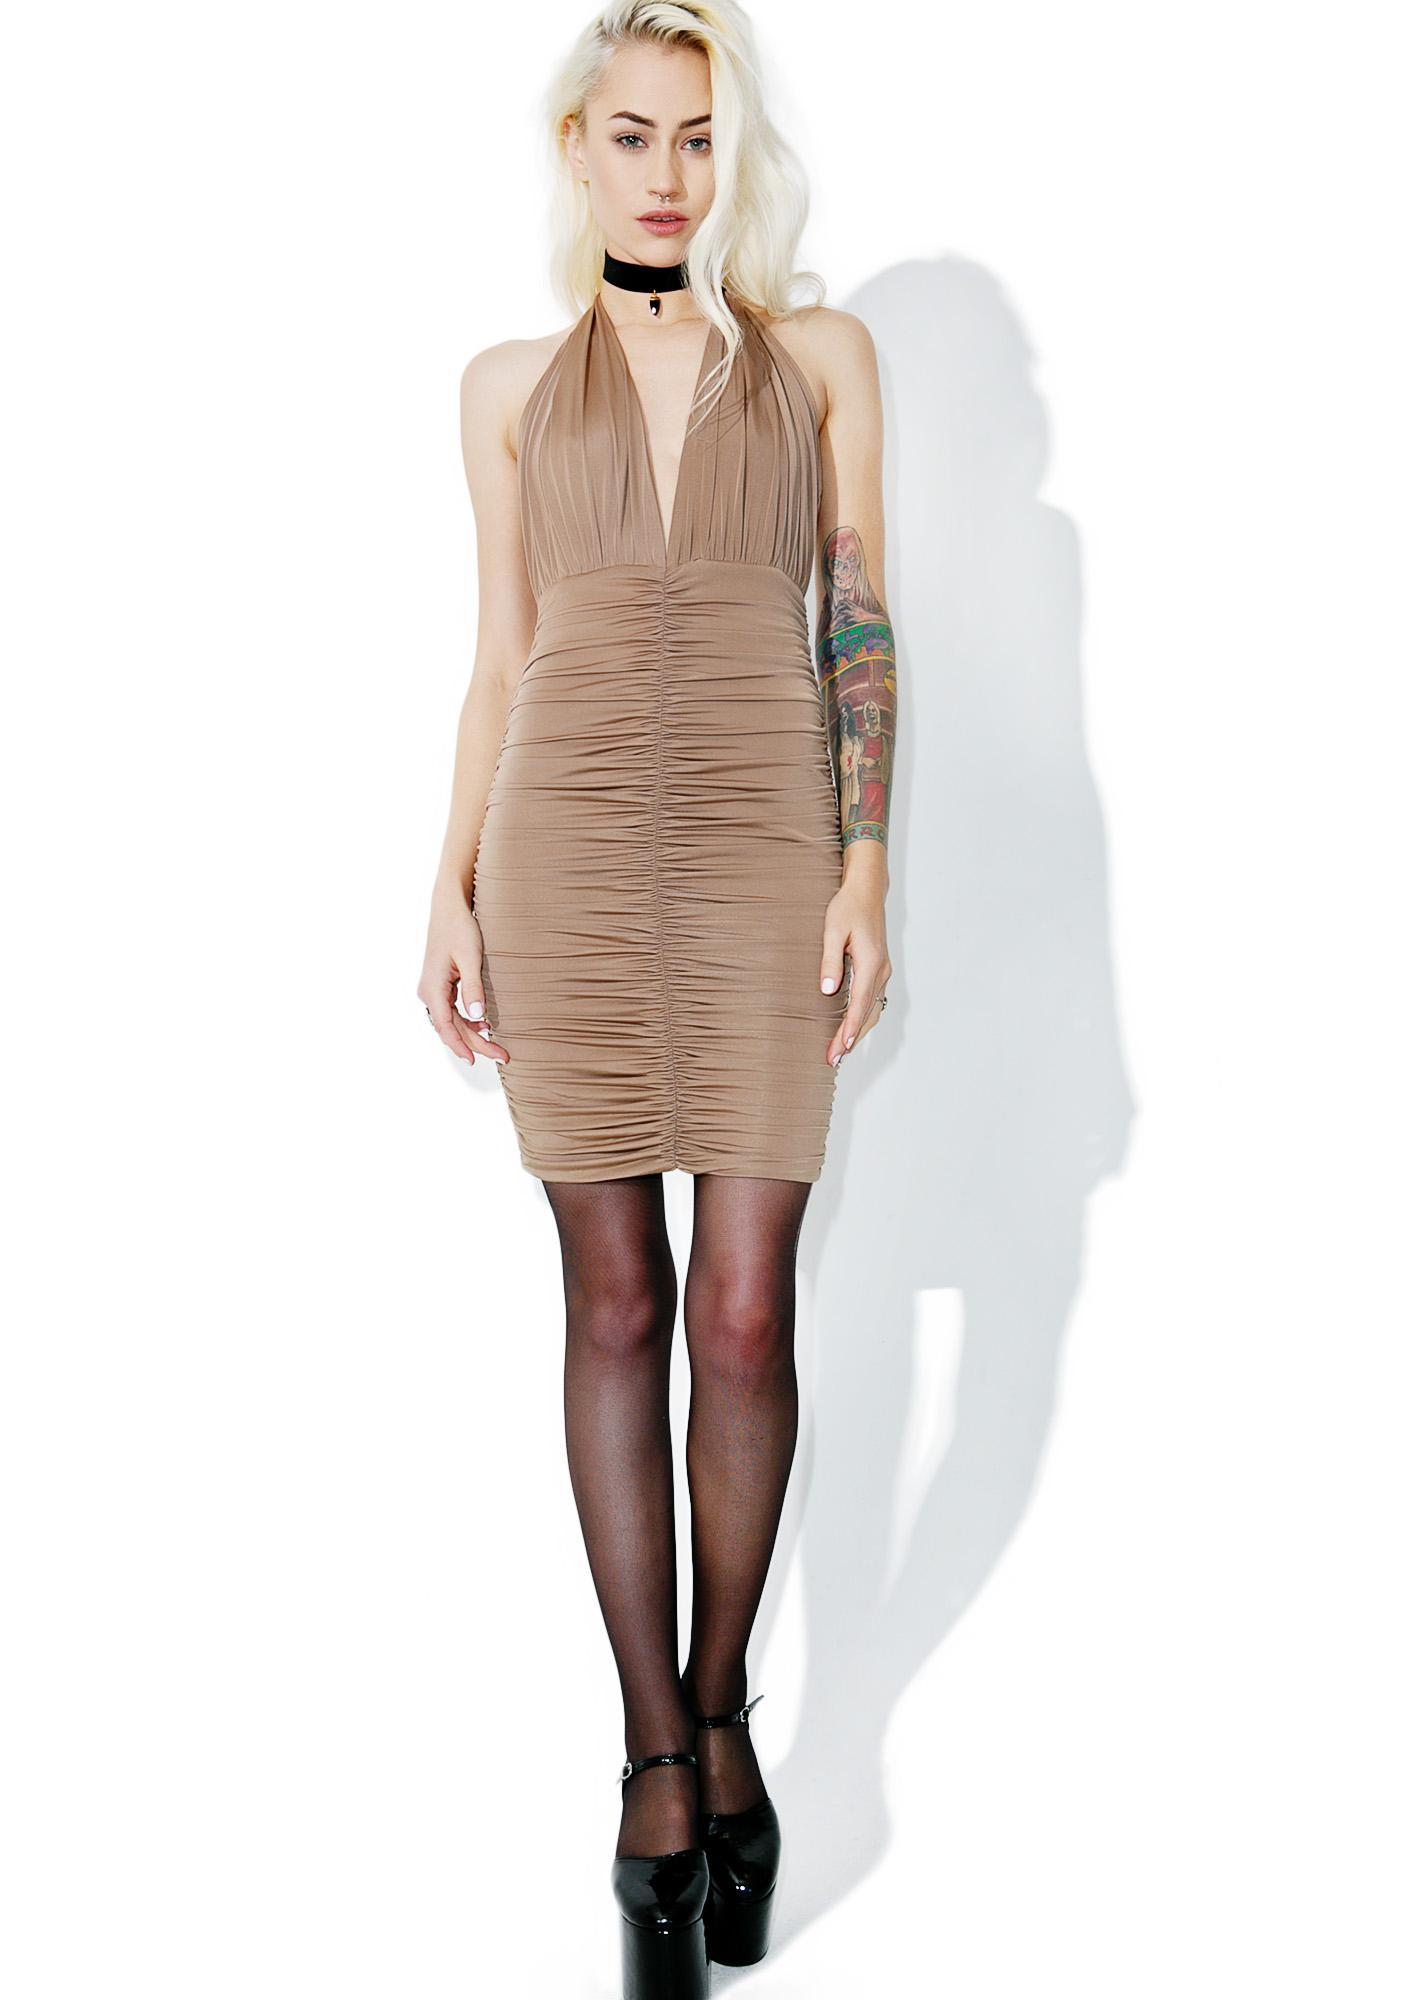 WYLDR Superstitions Dress